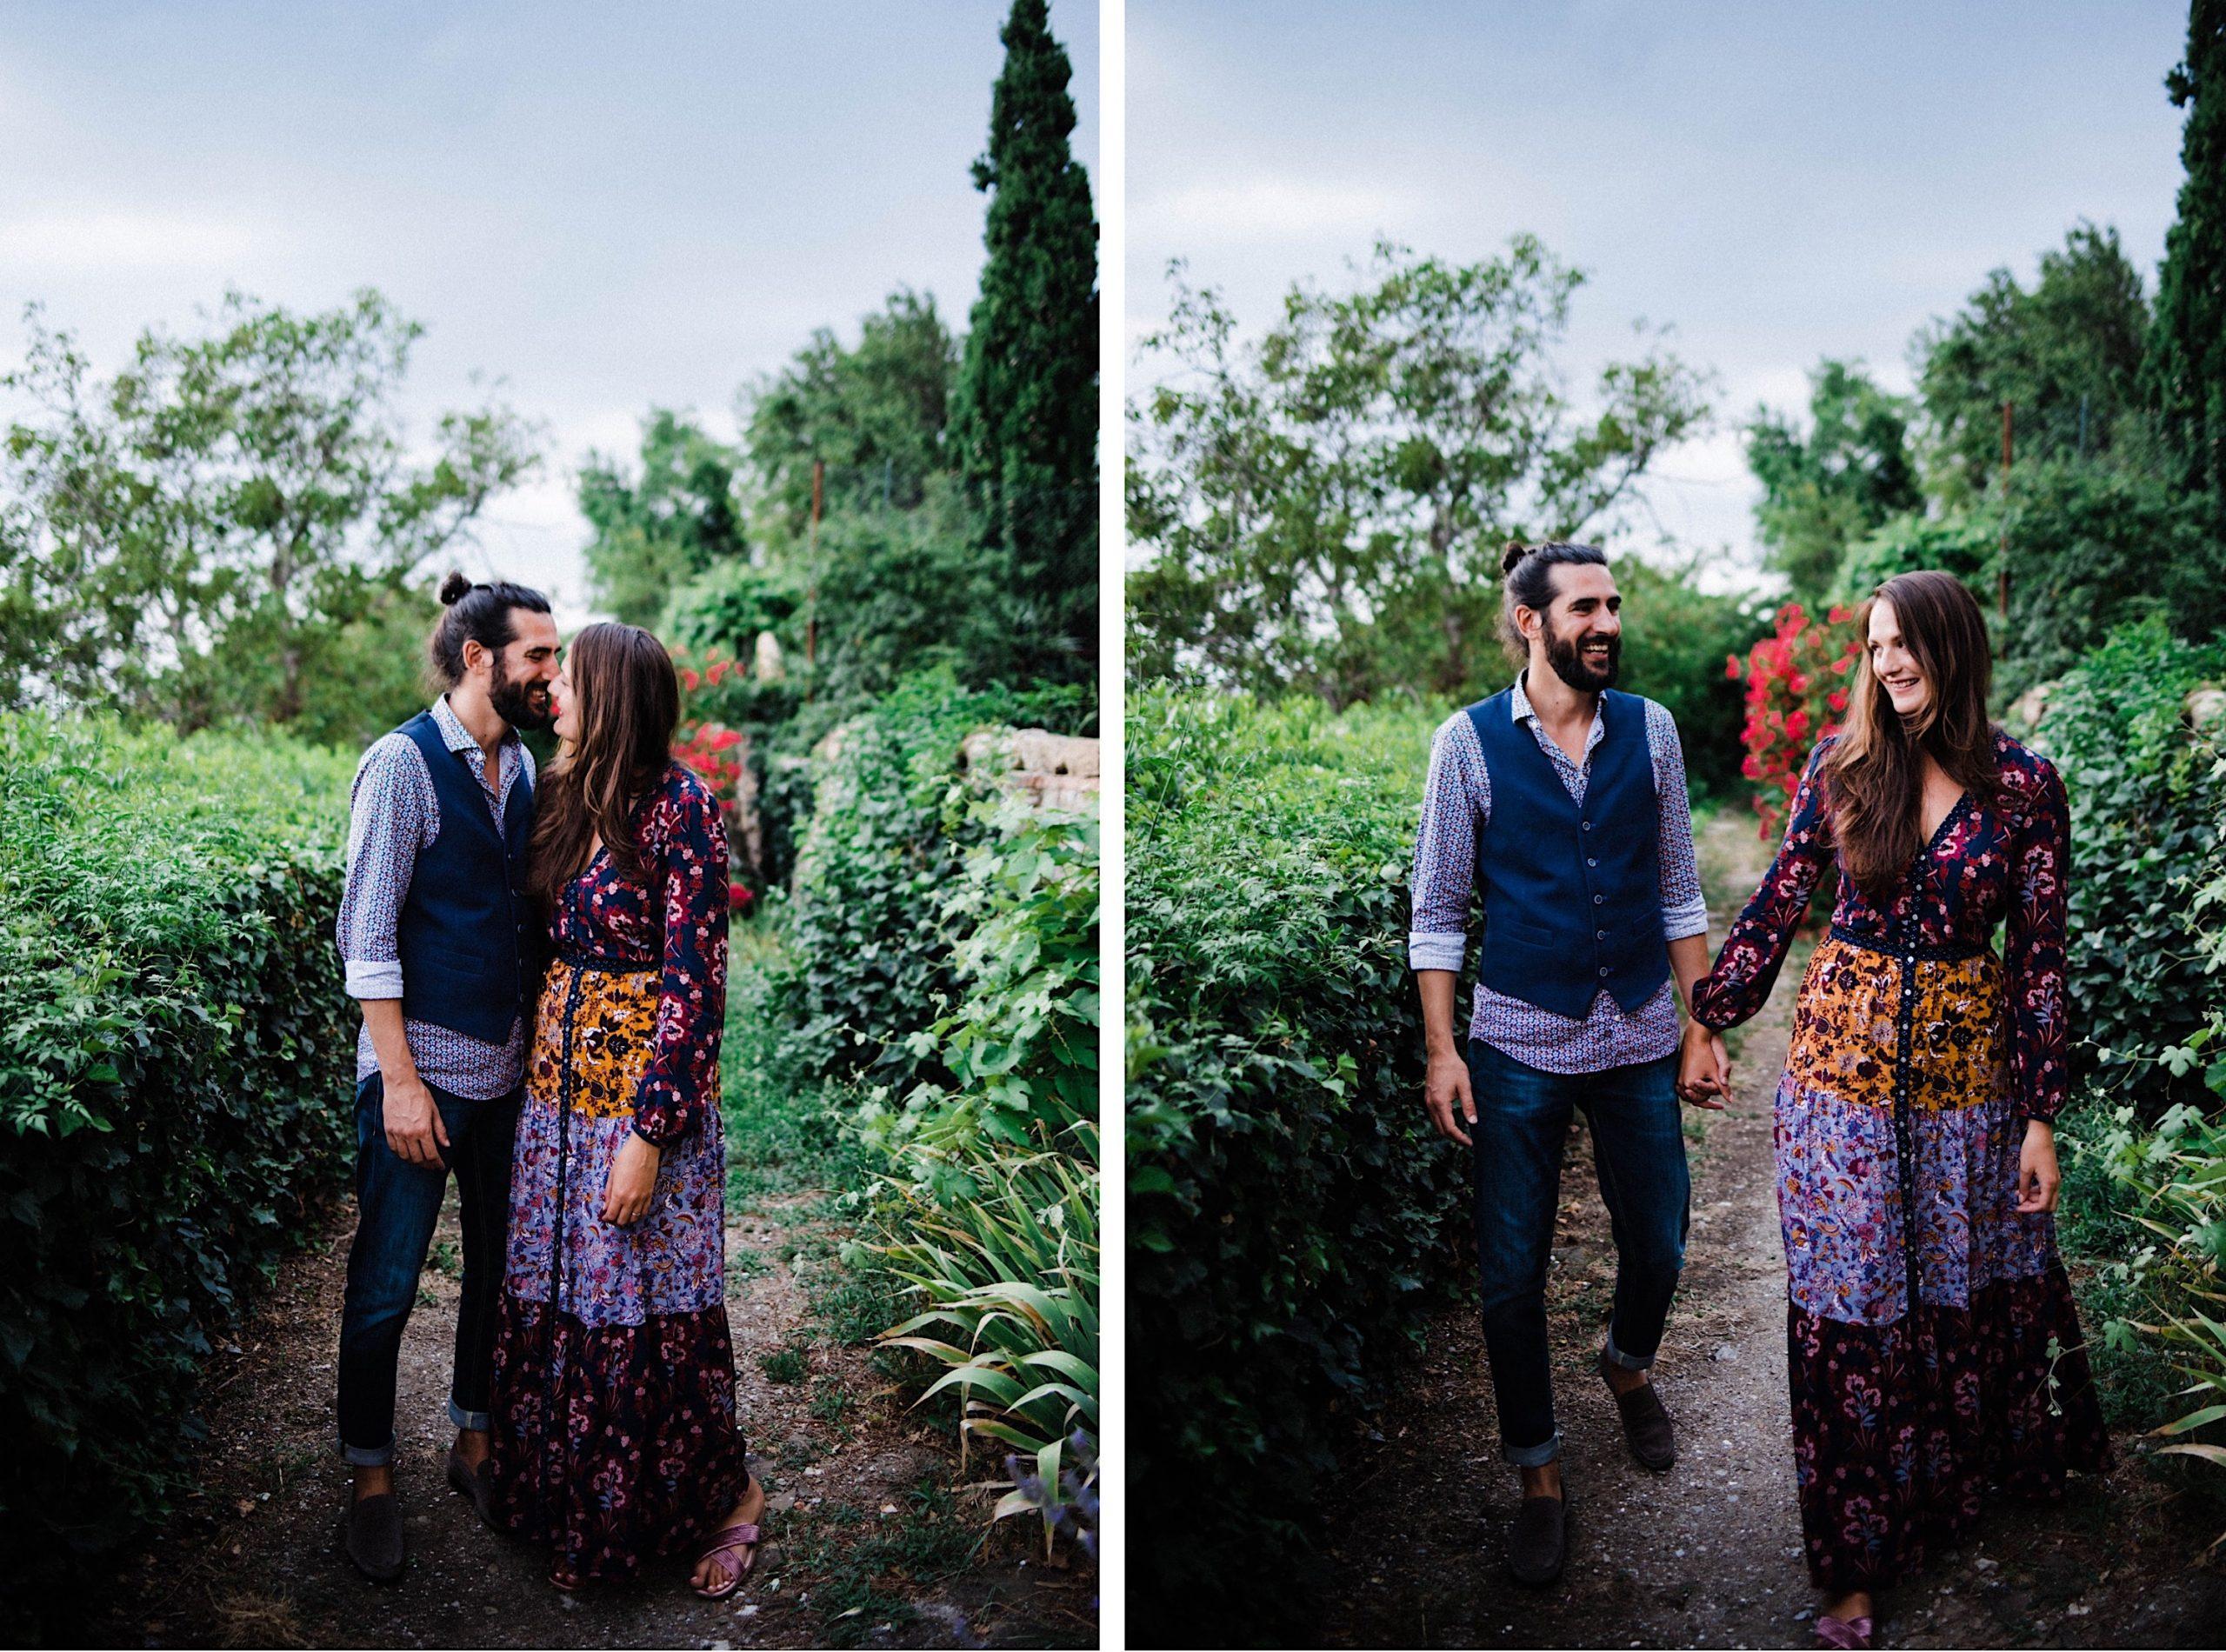 Side-by-side Italian elopement portraits of a newlywed couple walking through a garden near Osmiza Stoka, in the hills of Trieste.